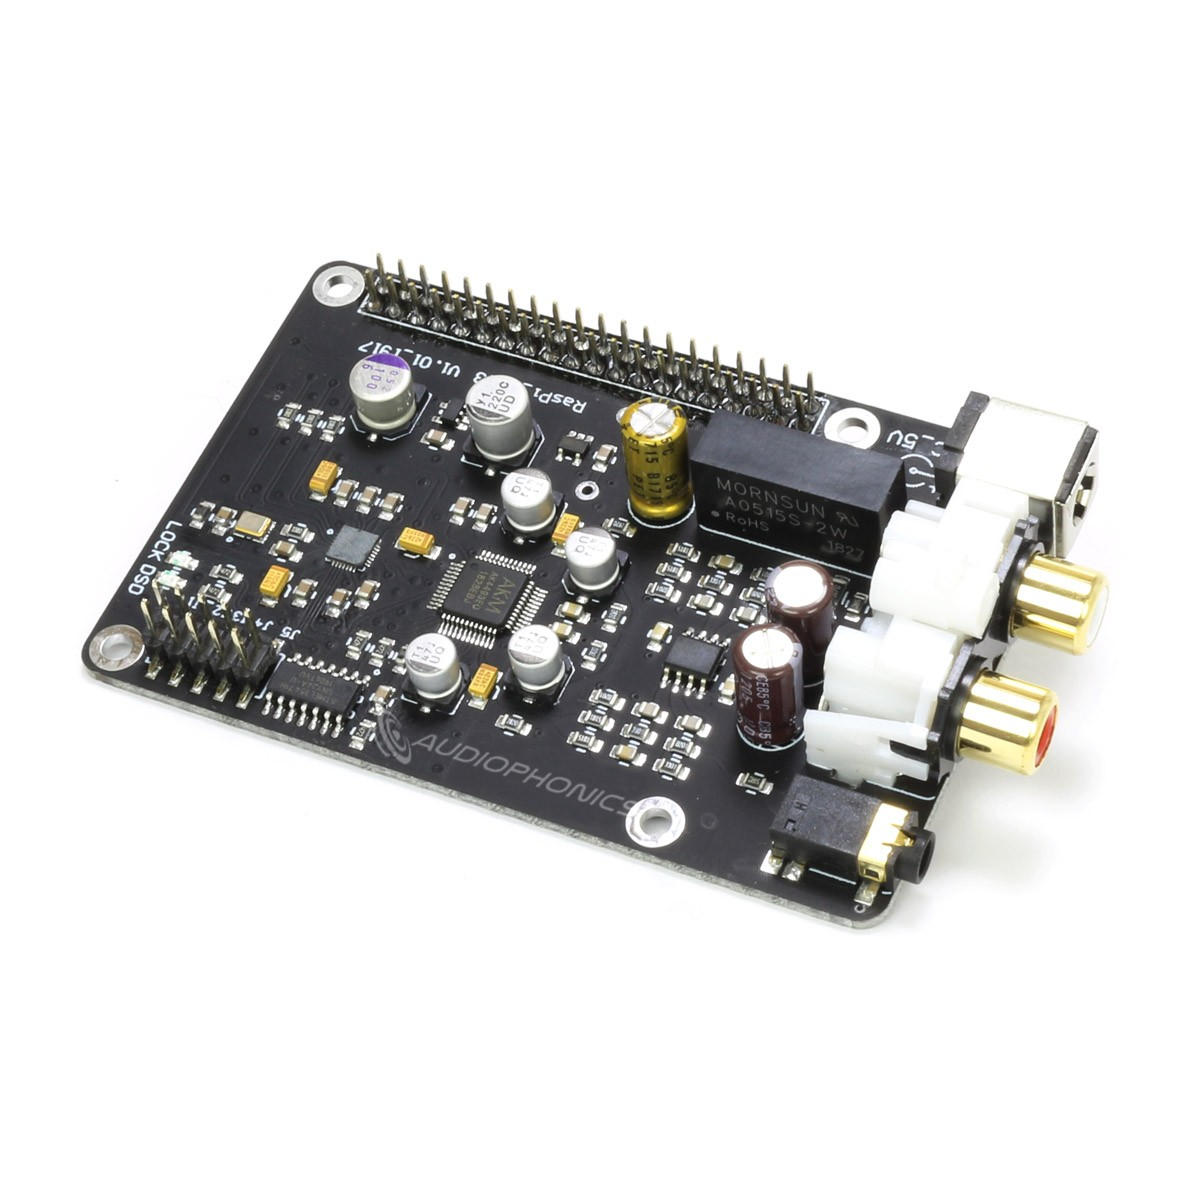 DAC AK4493 Module for Raspberry Pi I2S 32bit 384kHz DSD128